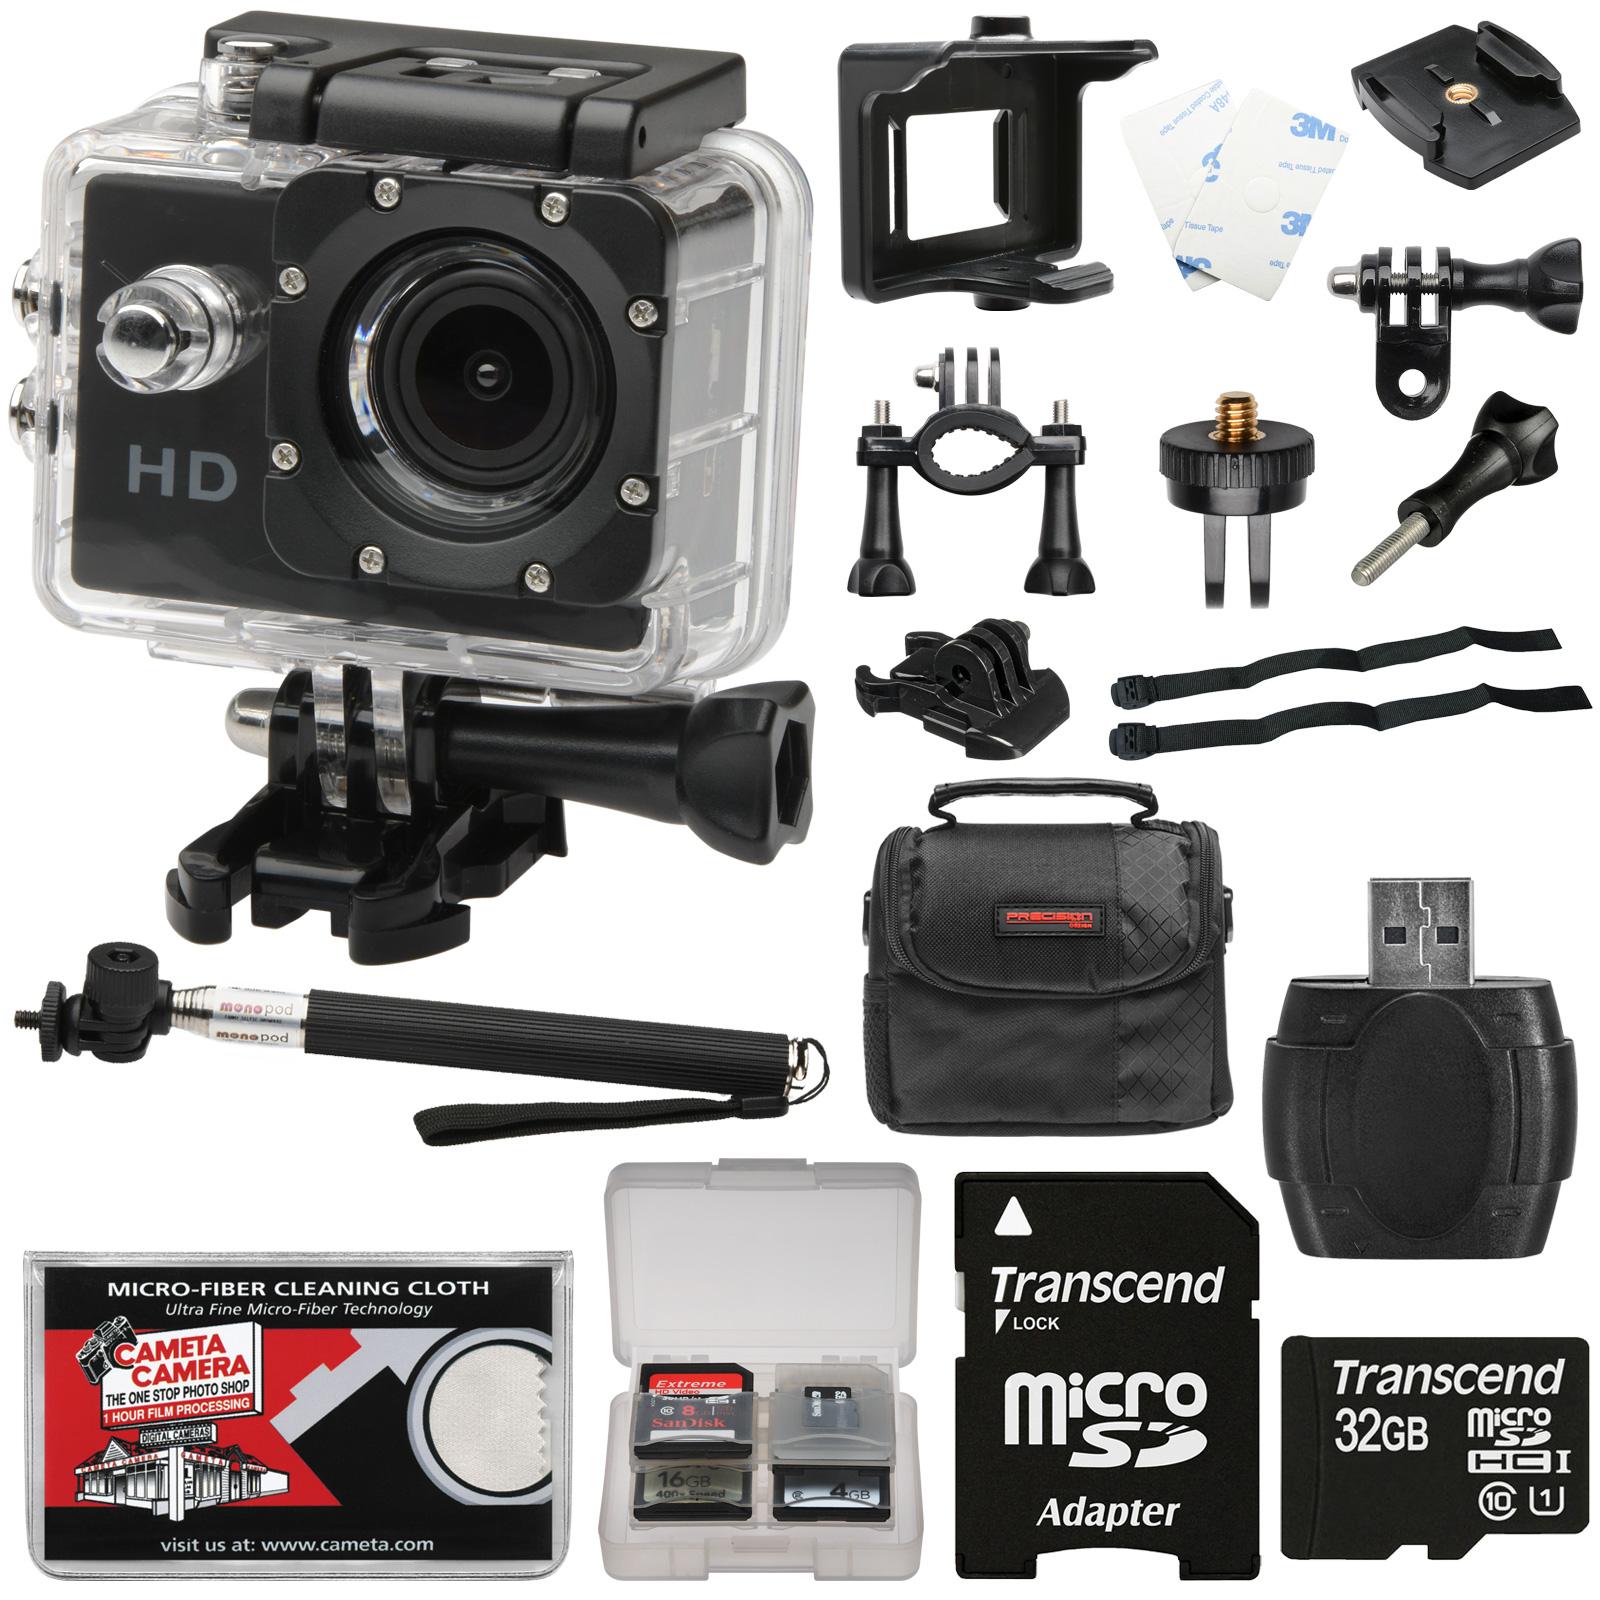 Zuma HD DVR 720p Sports Video Recorder Action Camera Camc...